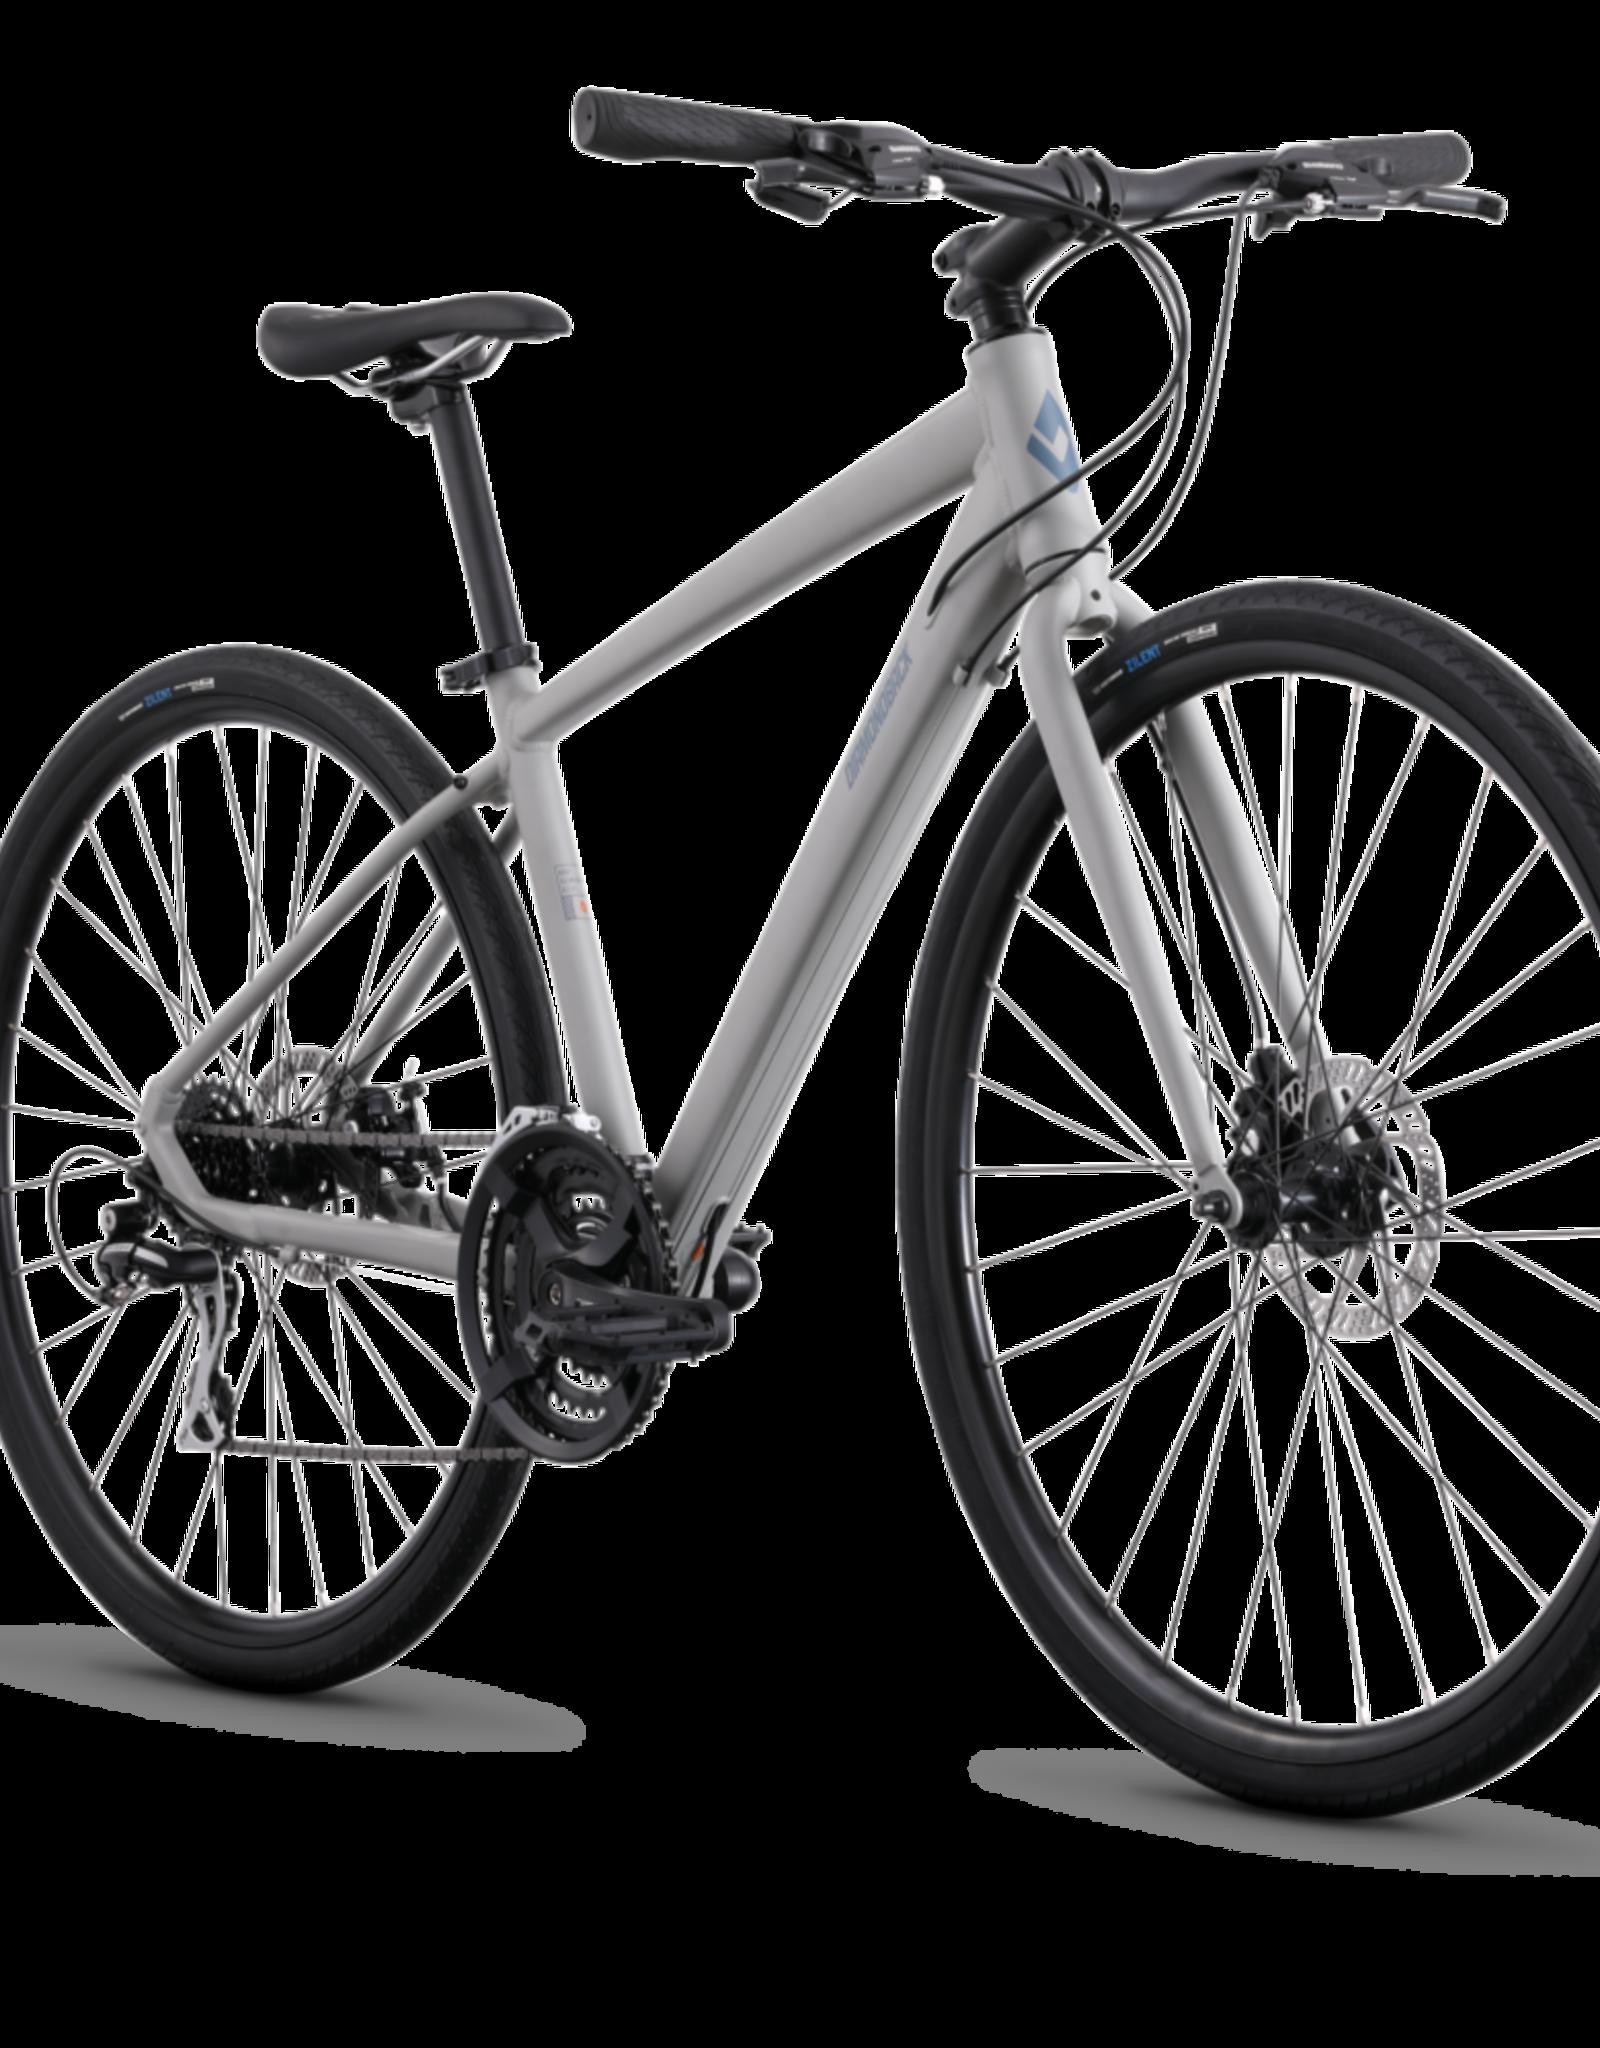 2021 Metric 2 Commuter Bicycle, Mechanical Brakes, MEDIUM